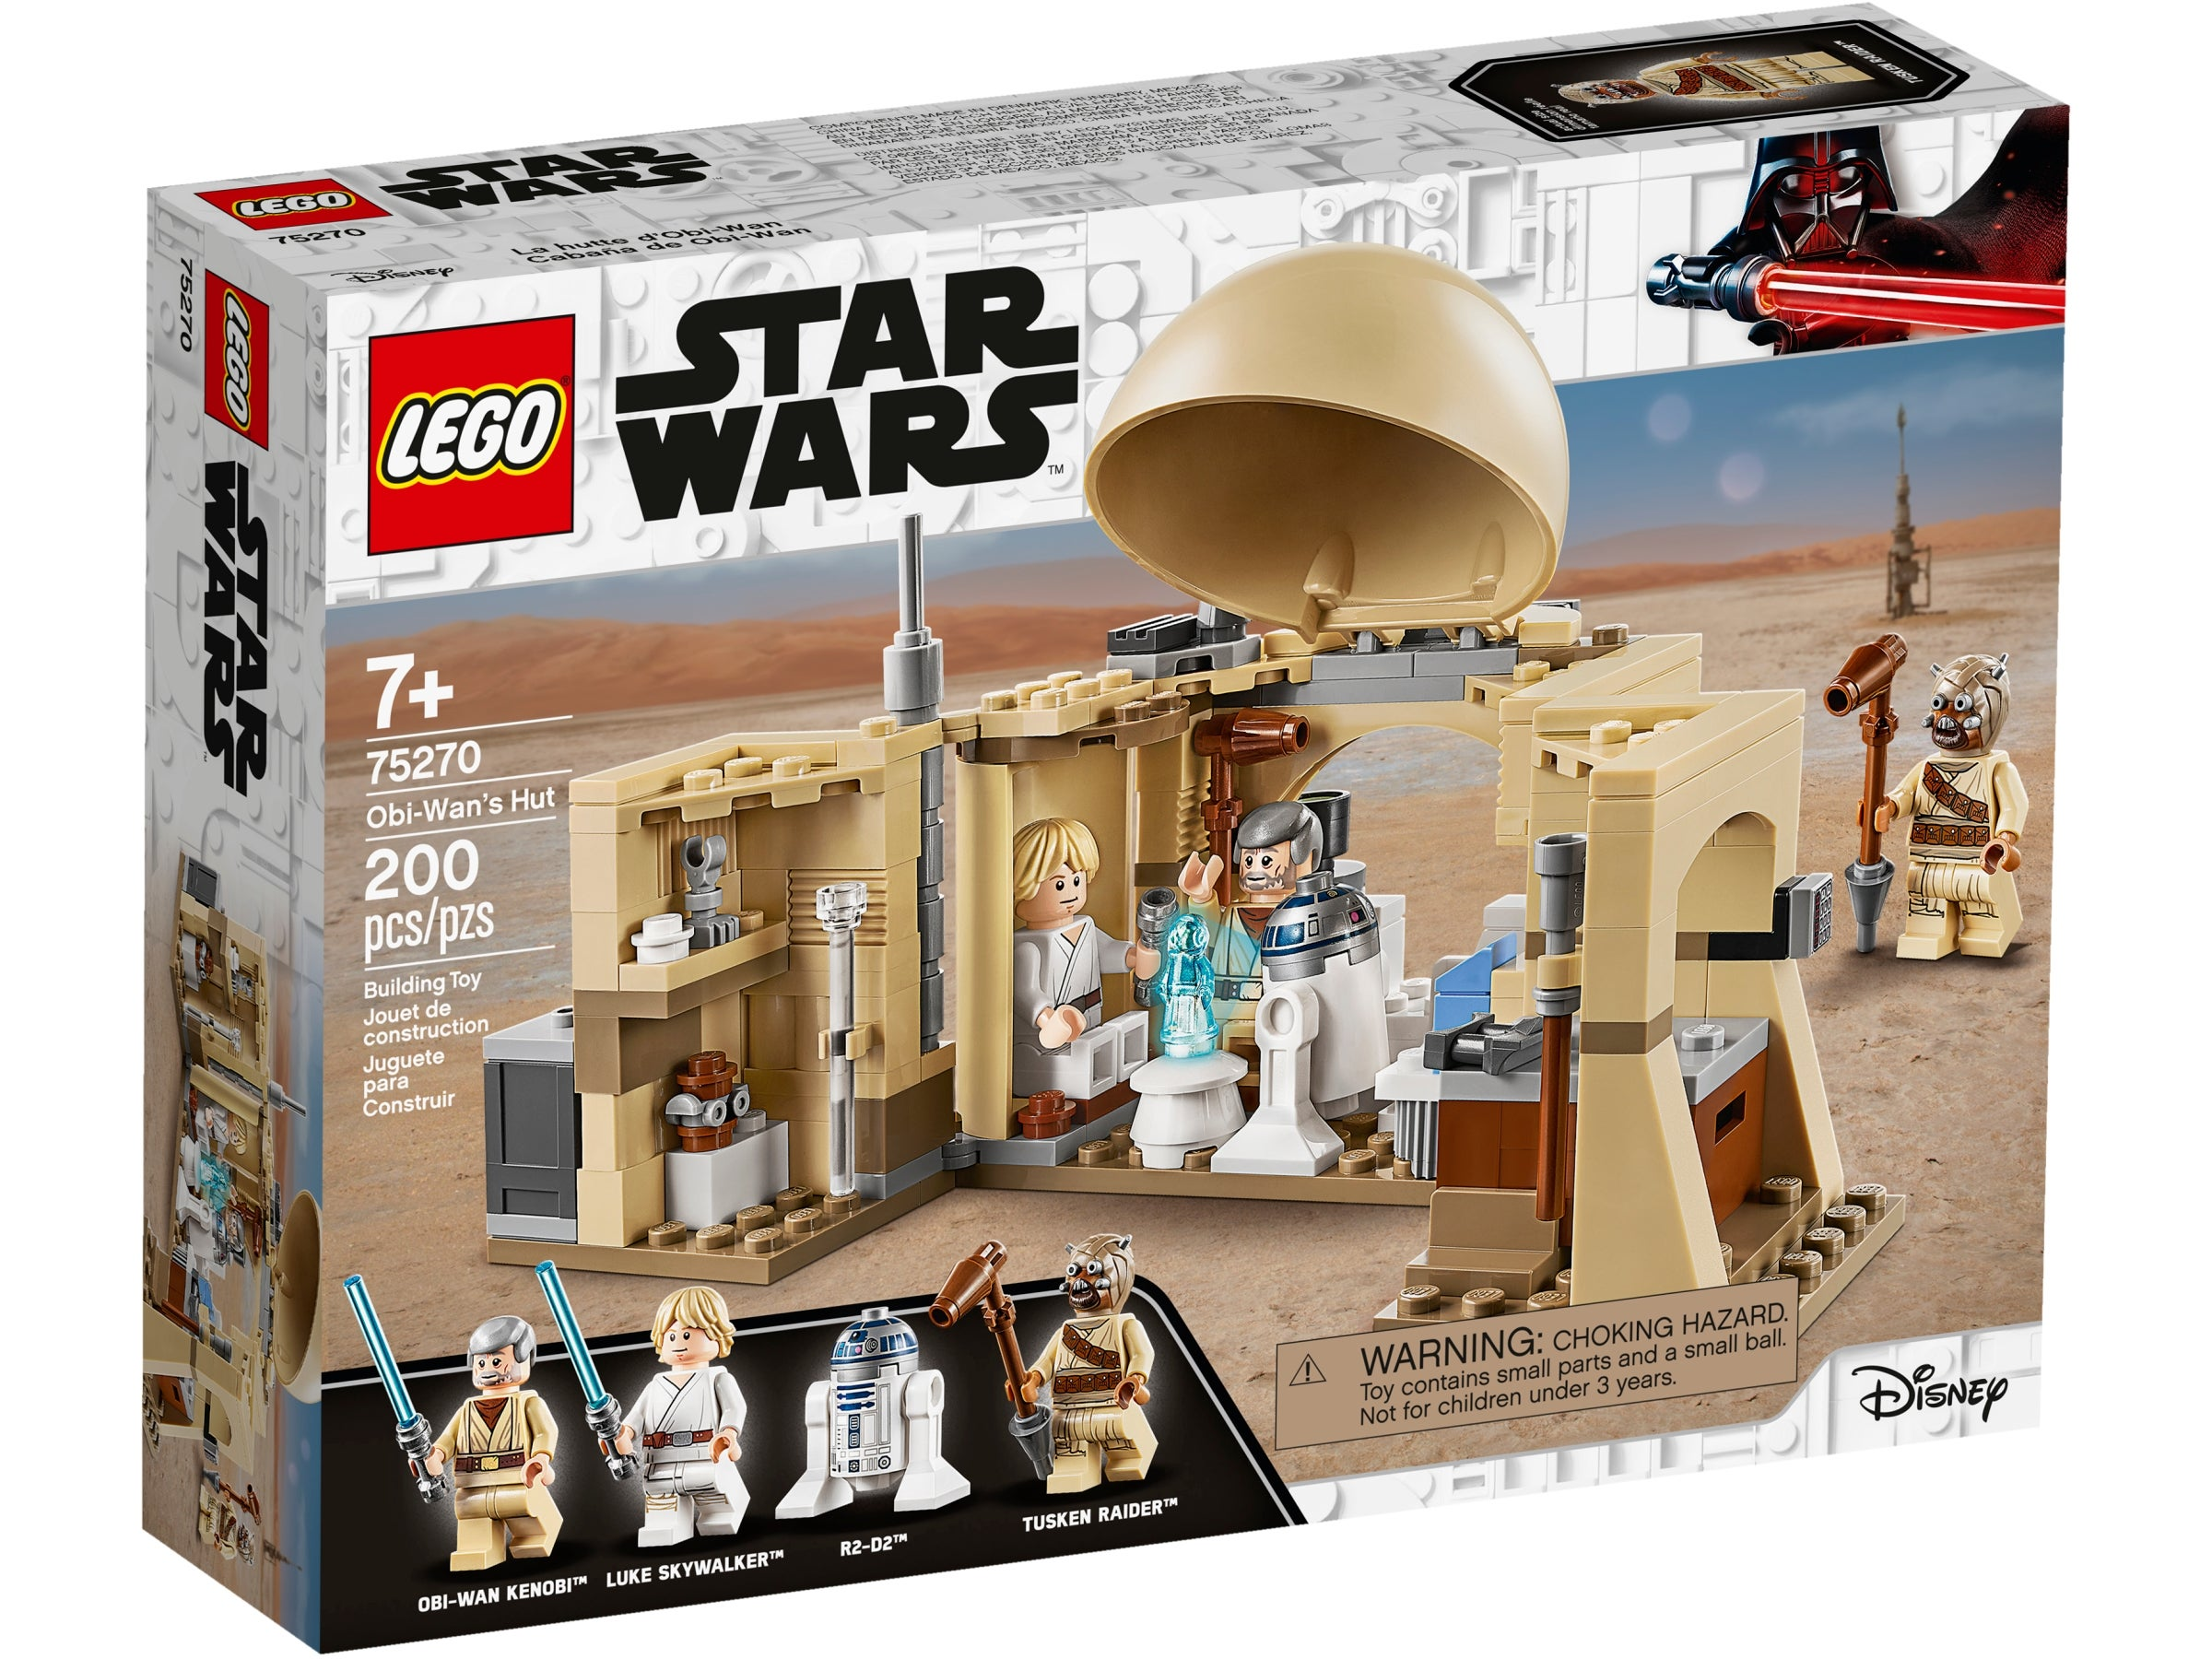 Lego Star Wars Obi-Wan's Hut Building Set with Princess Leia Hologram Set 75270